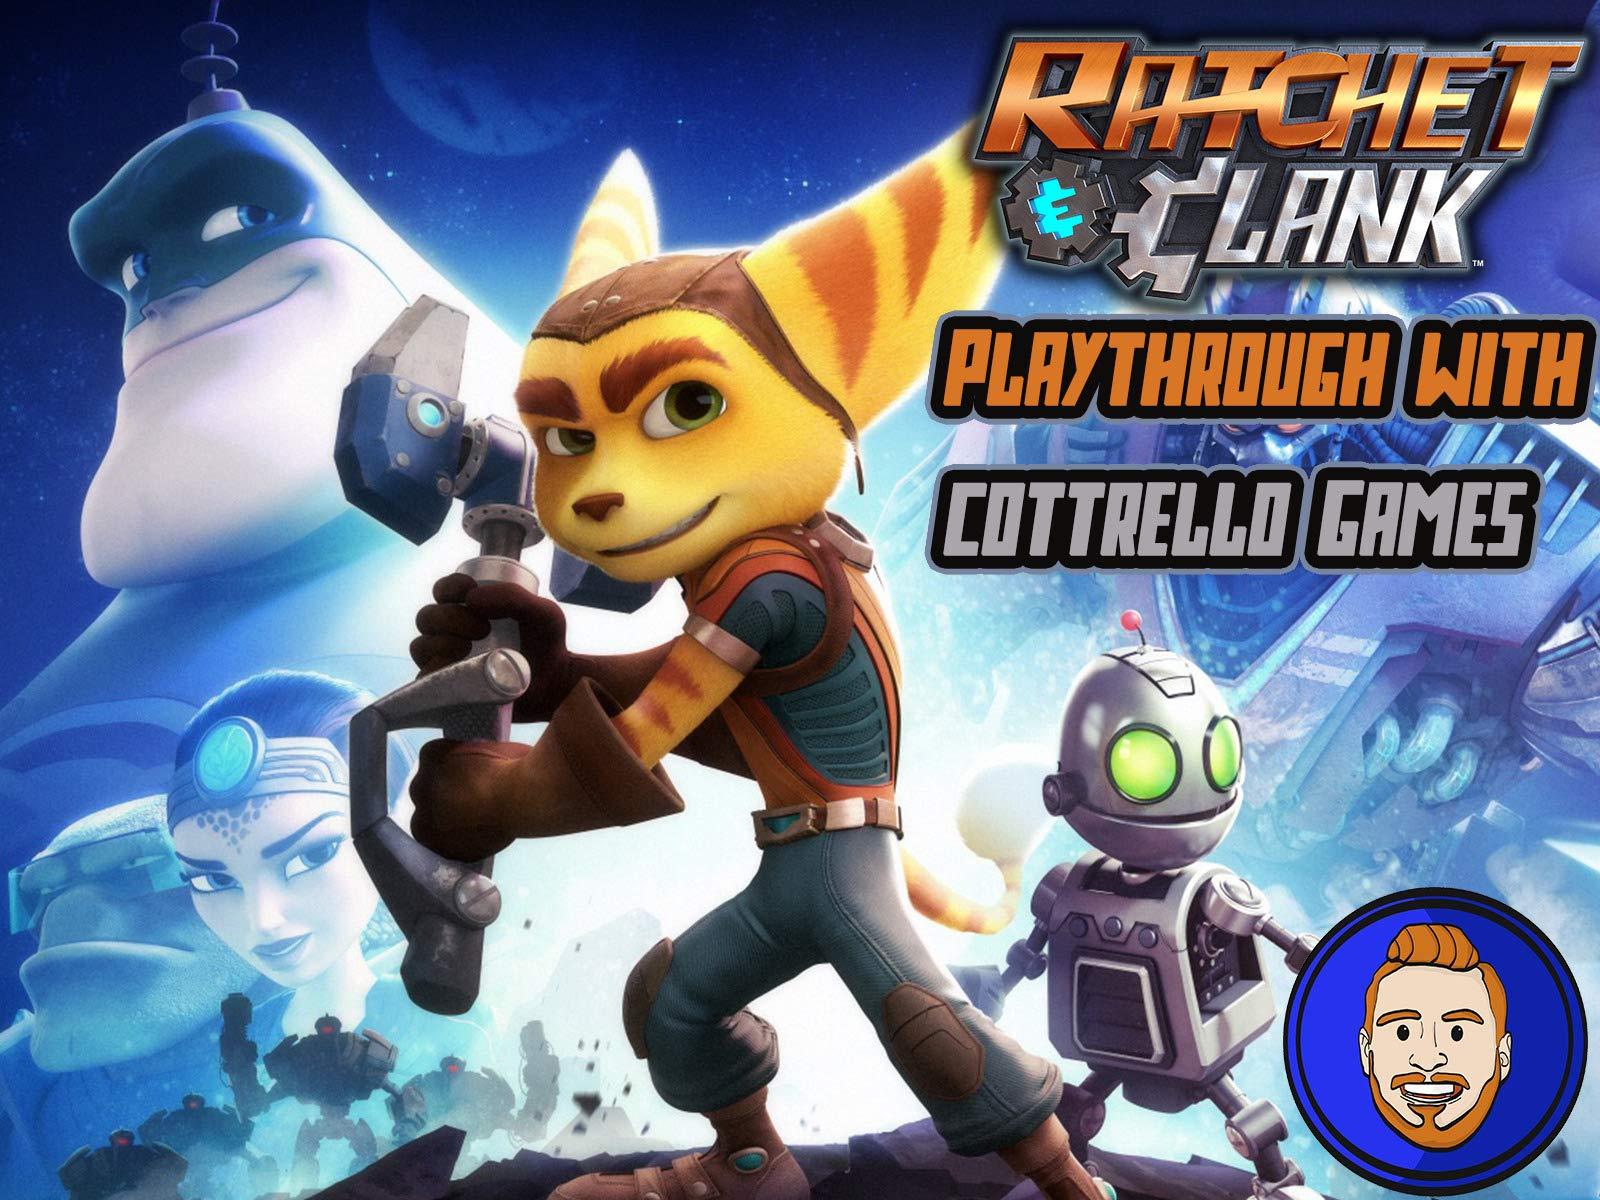 Ratchet & Clank Playthrough with Cottrello Games - Season 1